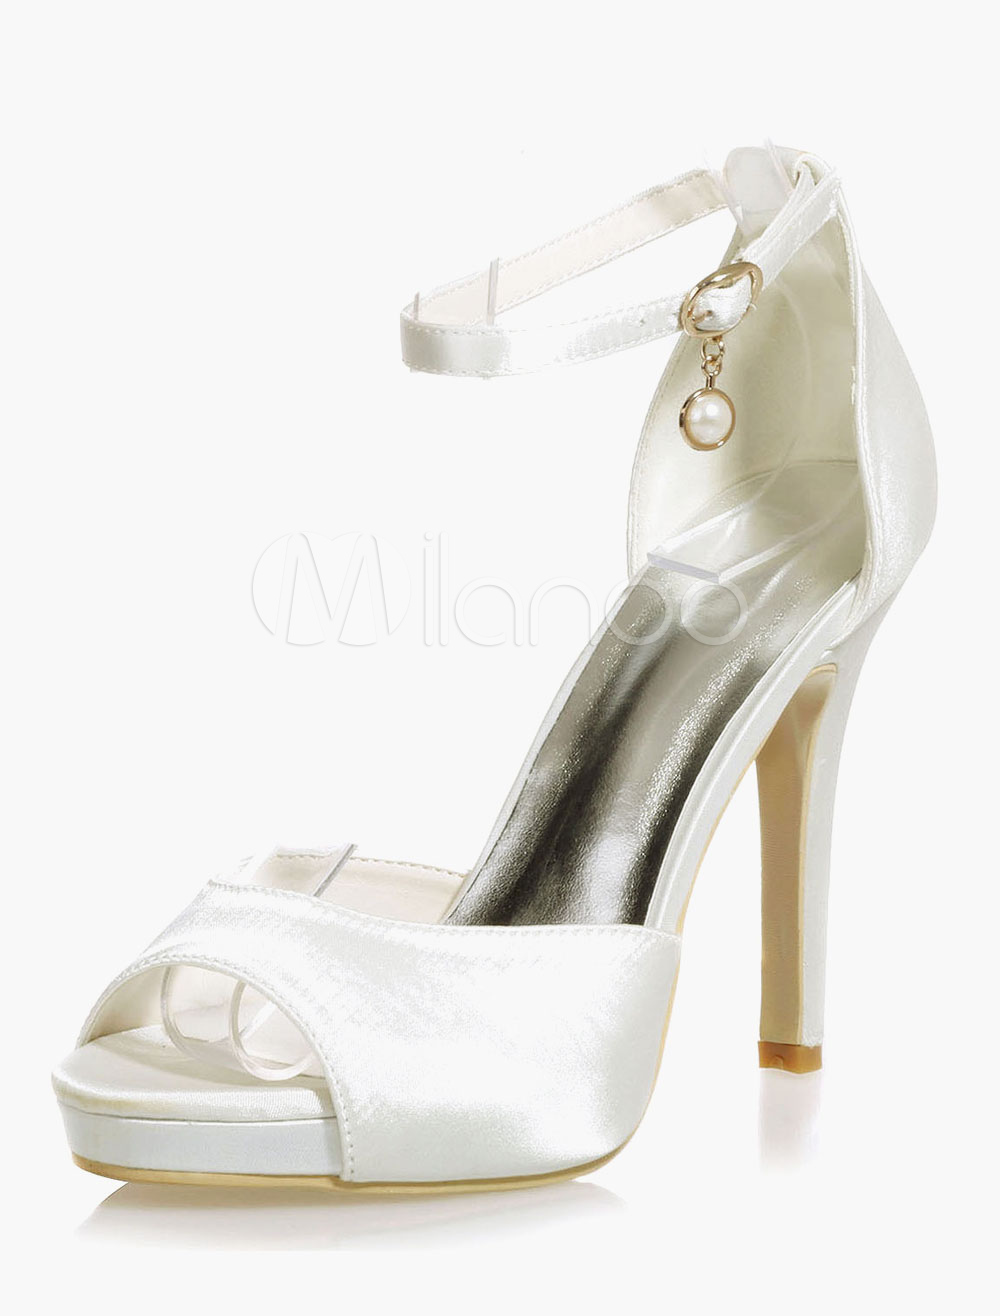 Gorgeous Platform Pearls Round Toe Satin Evening And Bride's Sandals